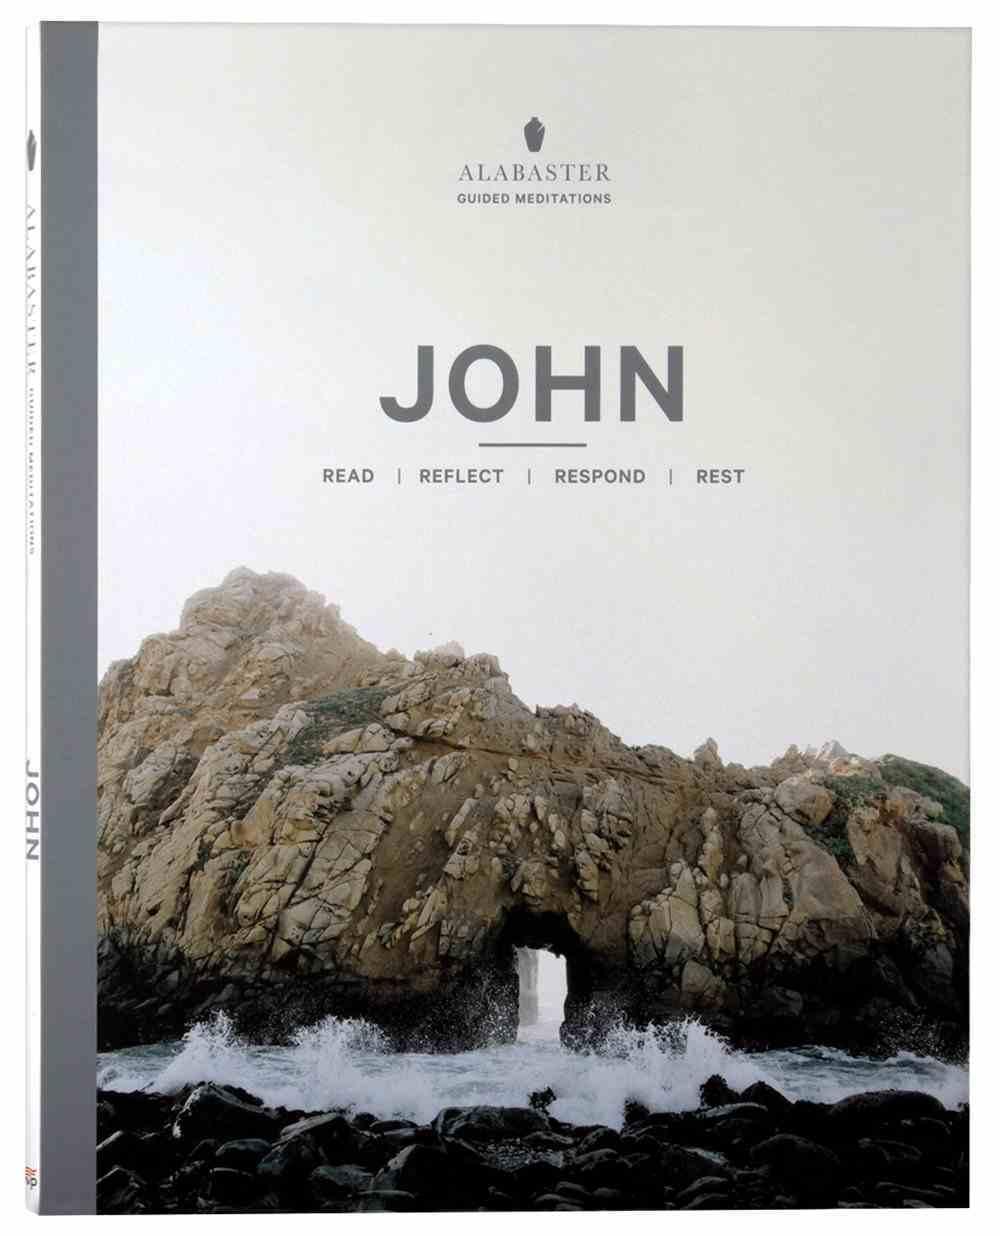 NLT John (Alabaster Guided Meditations Series) (Alabaster Guided Meditations Series) Paperback